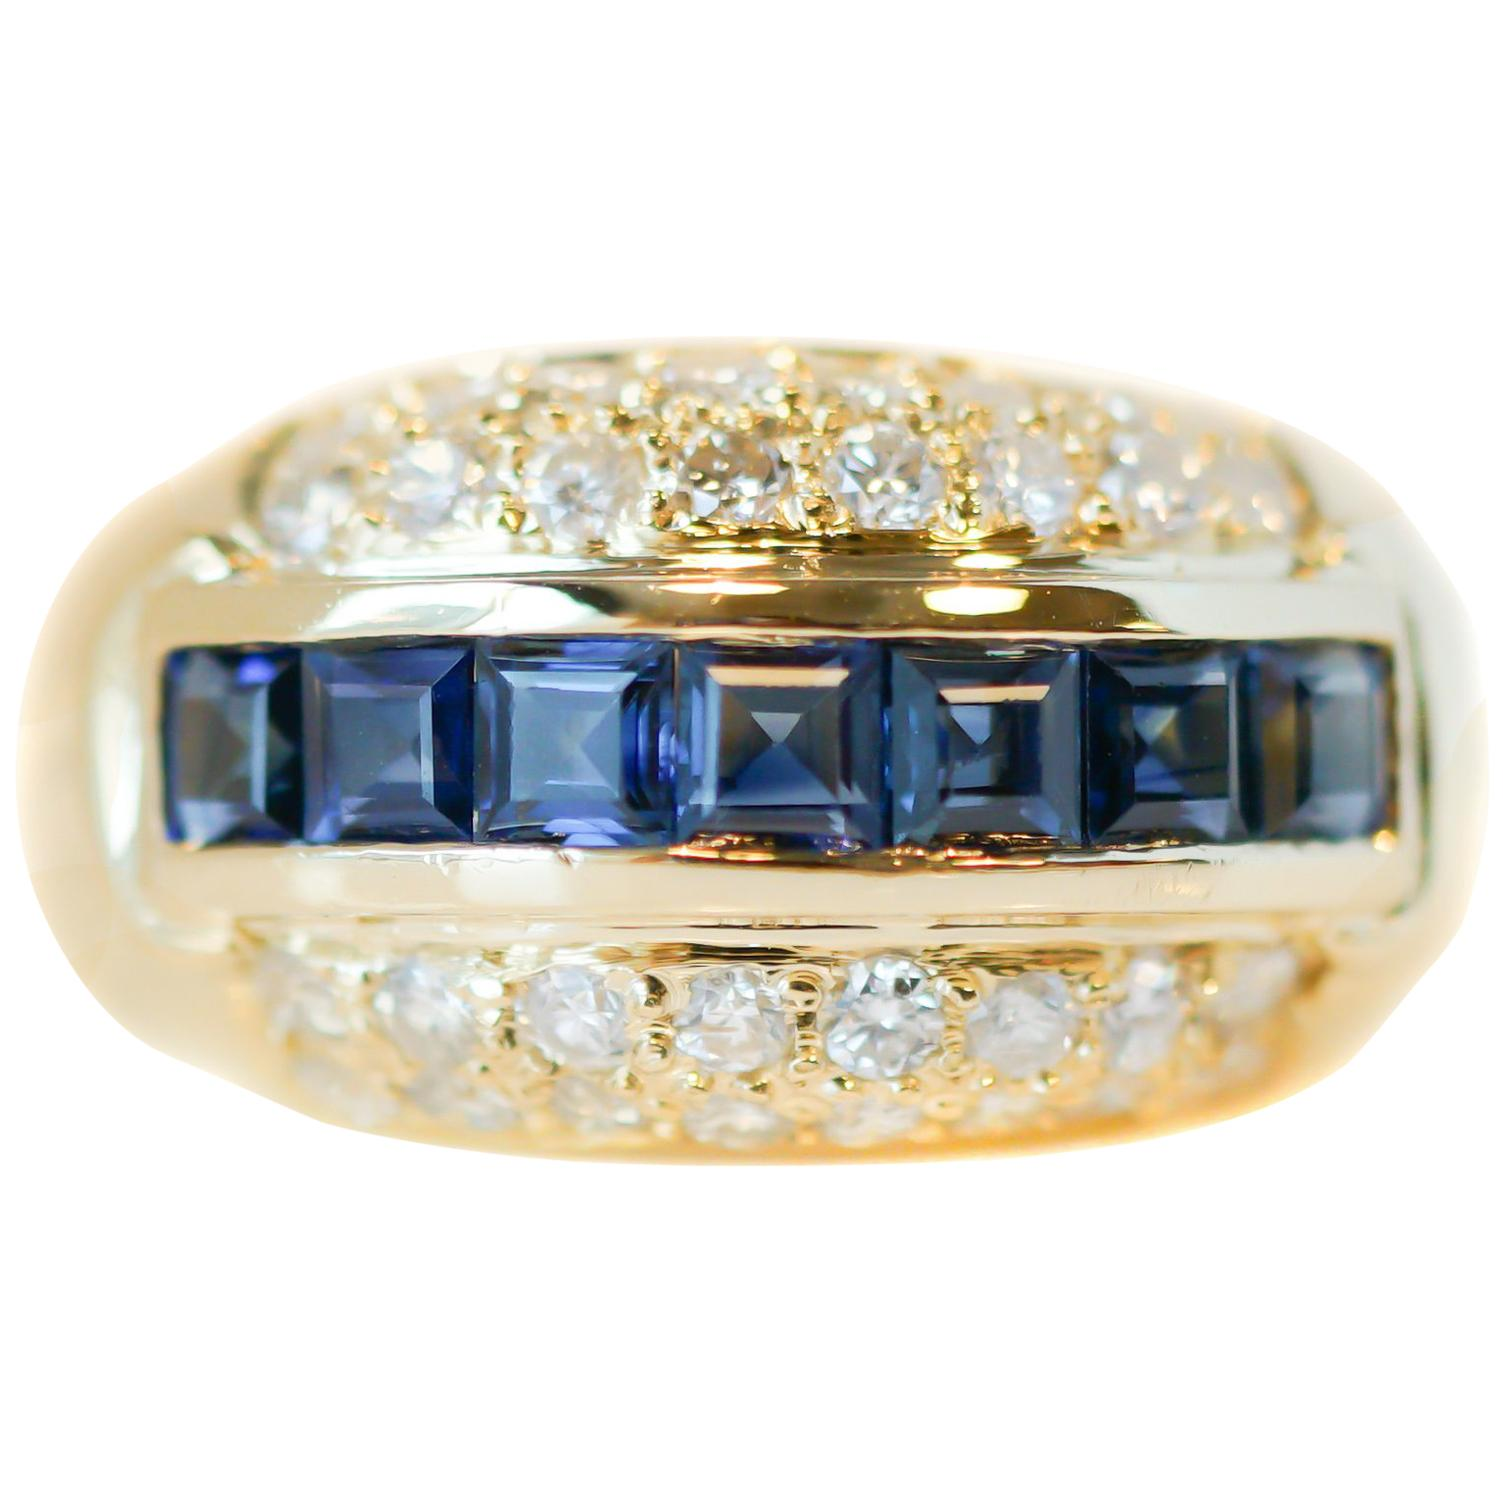 1940s Sapphire and Diamond 18 Karat Yellow Gold Cocktail Ring